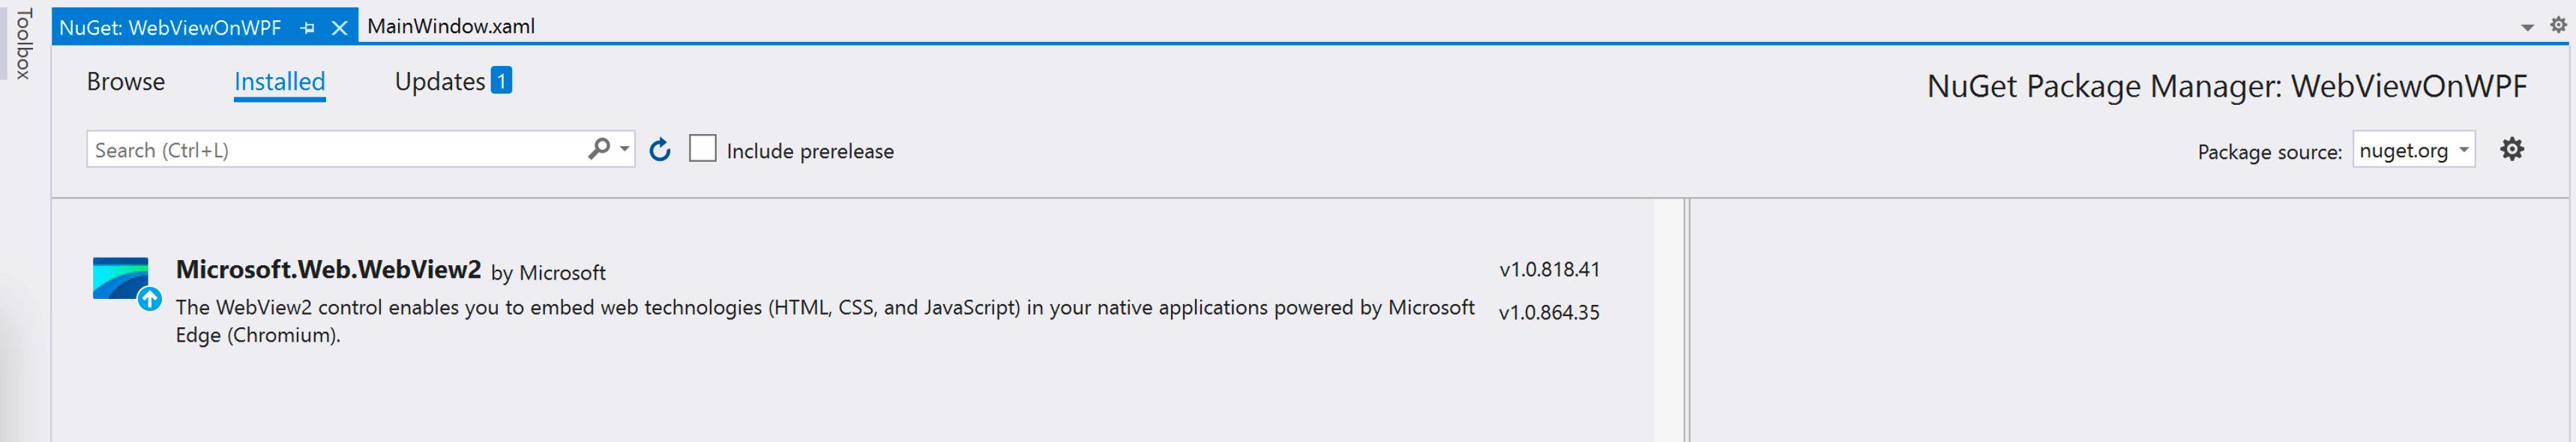 NuGet: WebViewOnWPF MainWindow.xaml, under Installed is Microsoft.Web.WebView2.